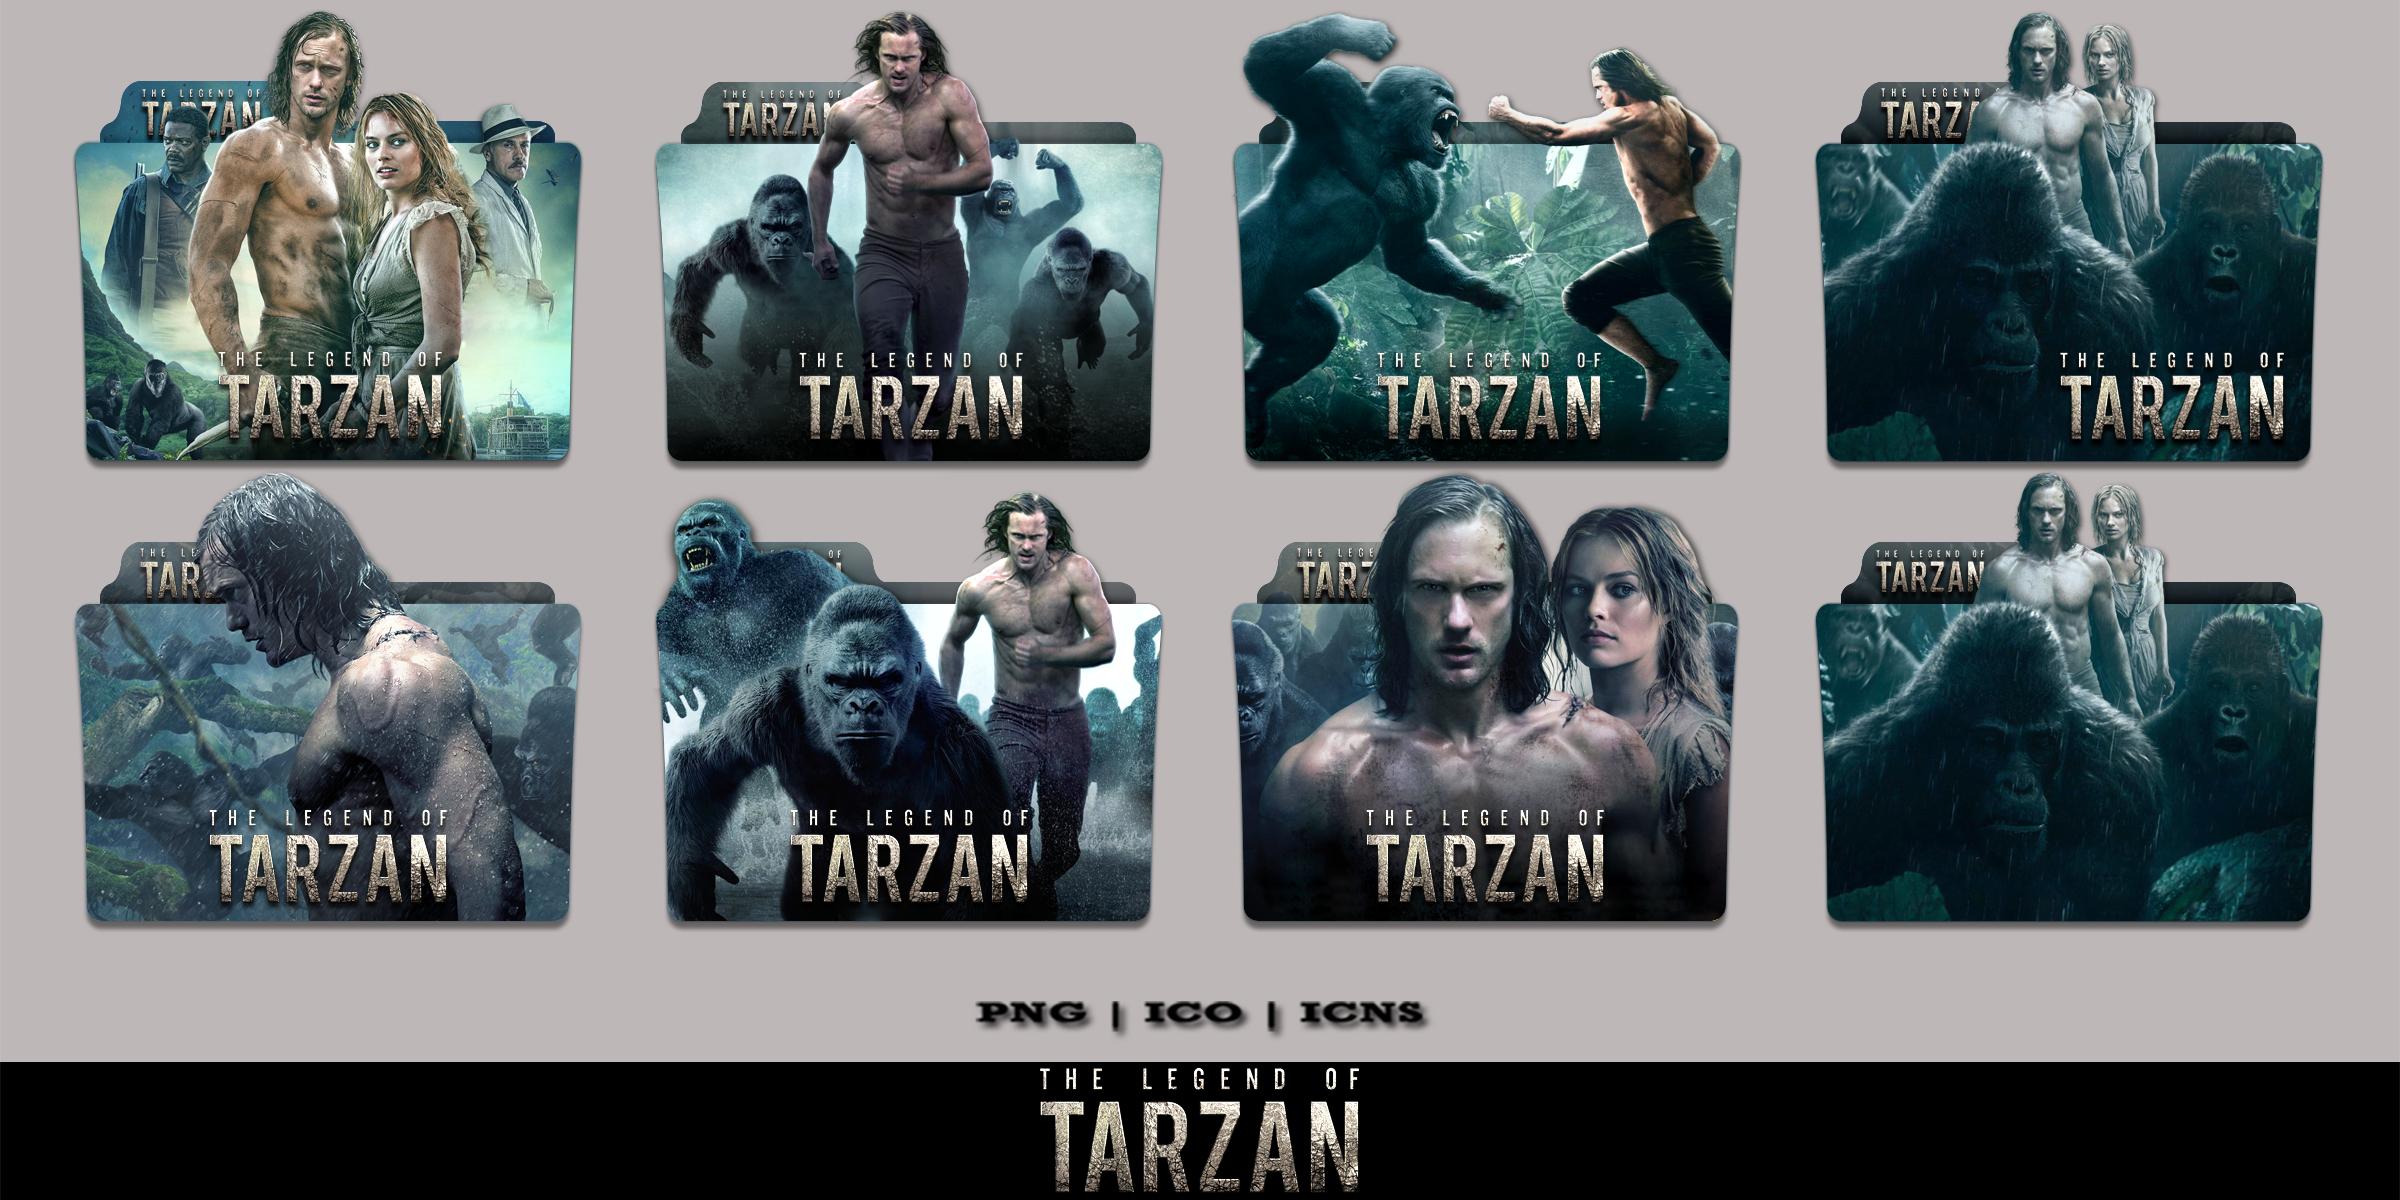 The Legend Of Tarzan 2016 Folder Icon Pack By Bl4cksl4yer On Deviantart